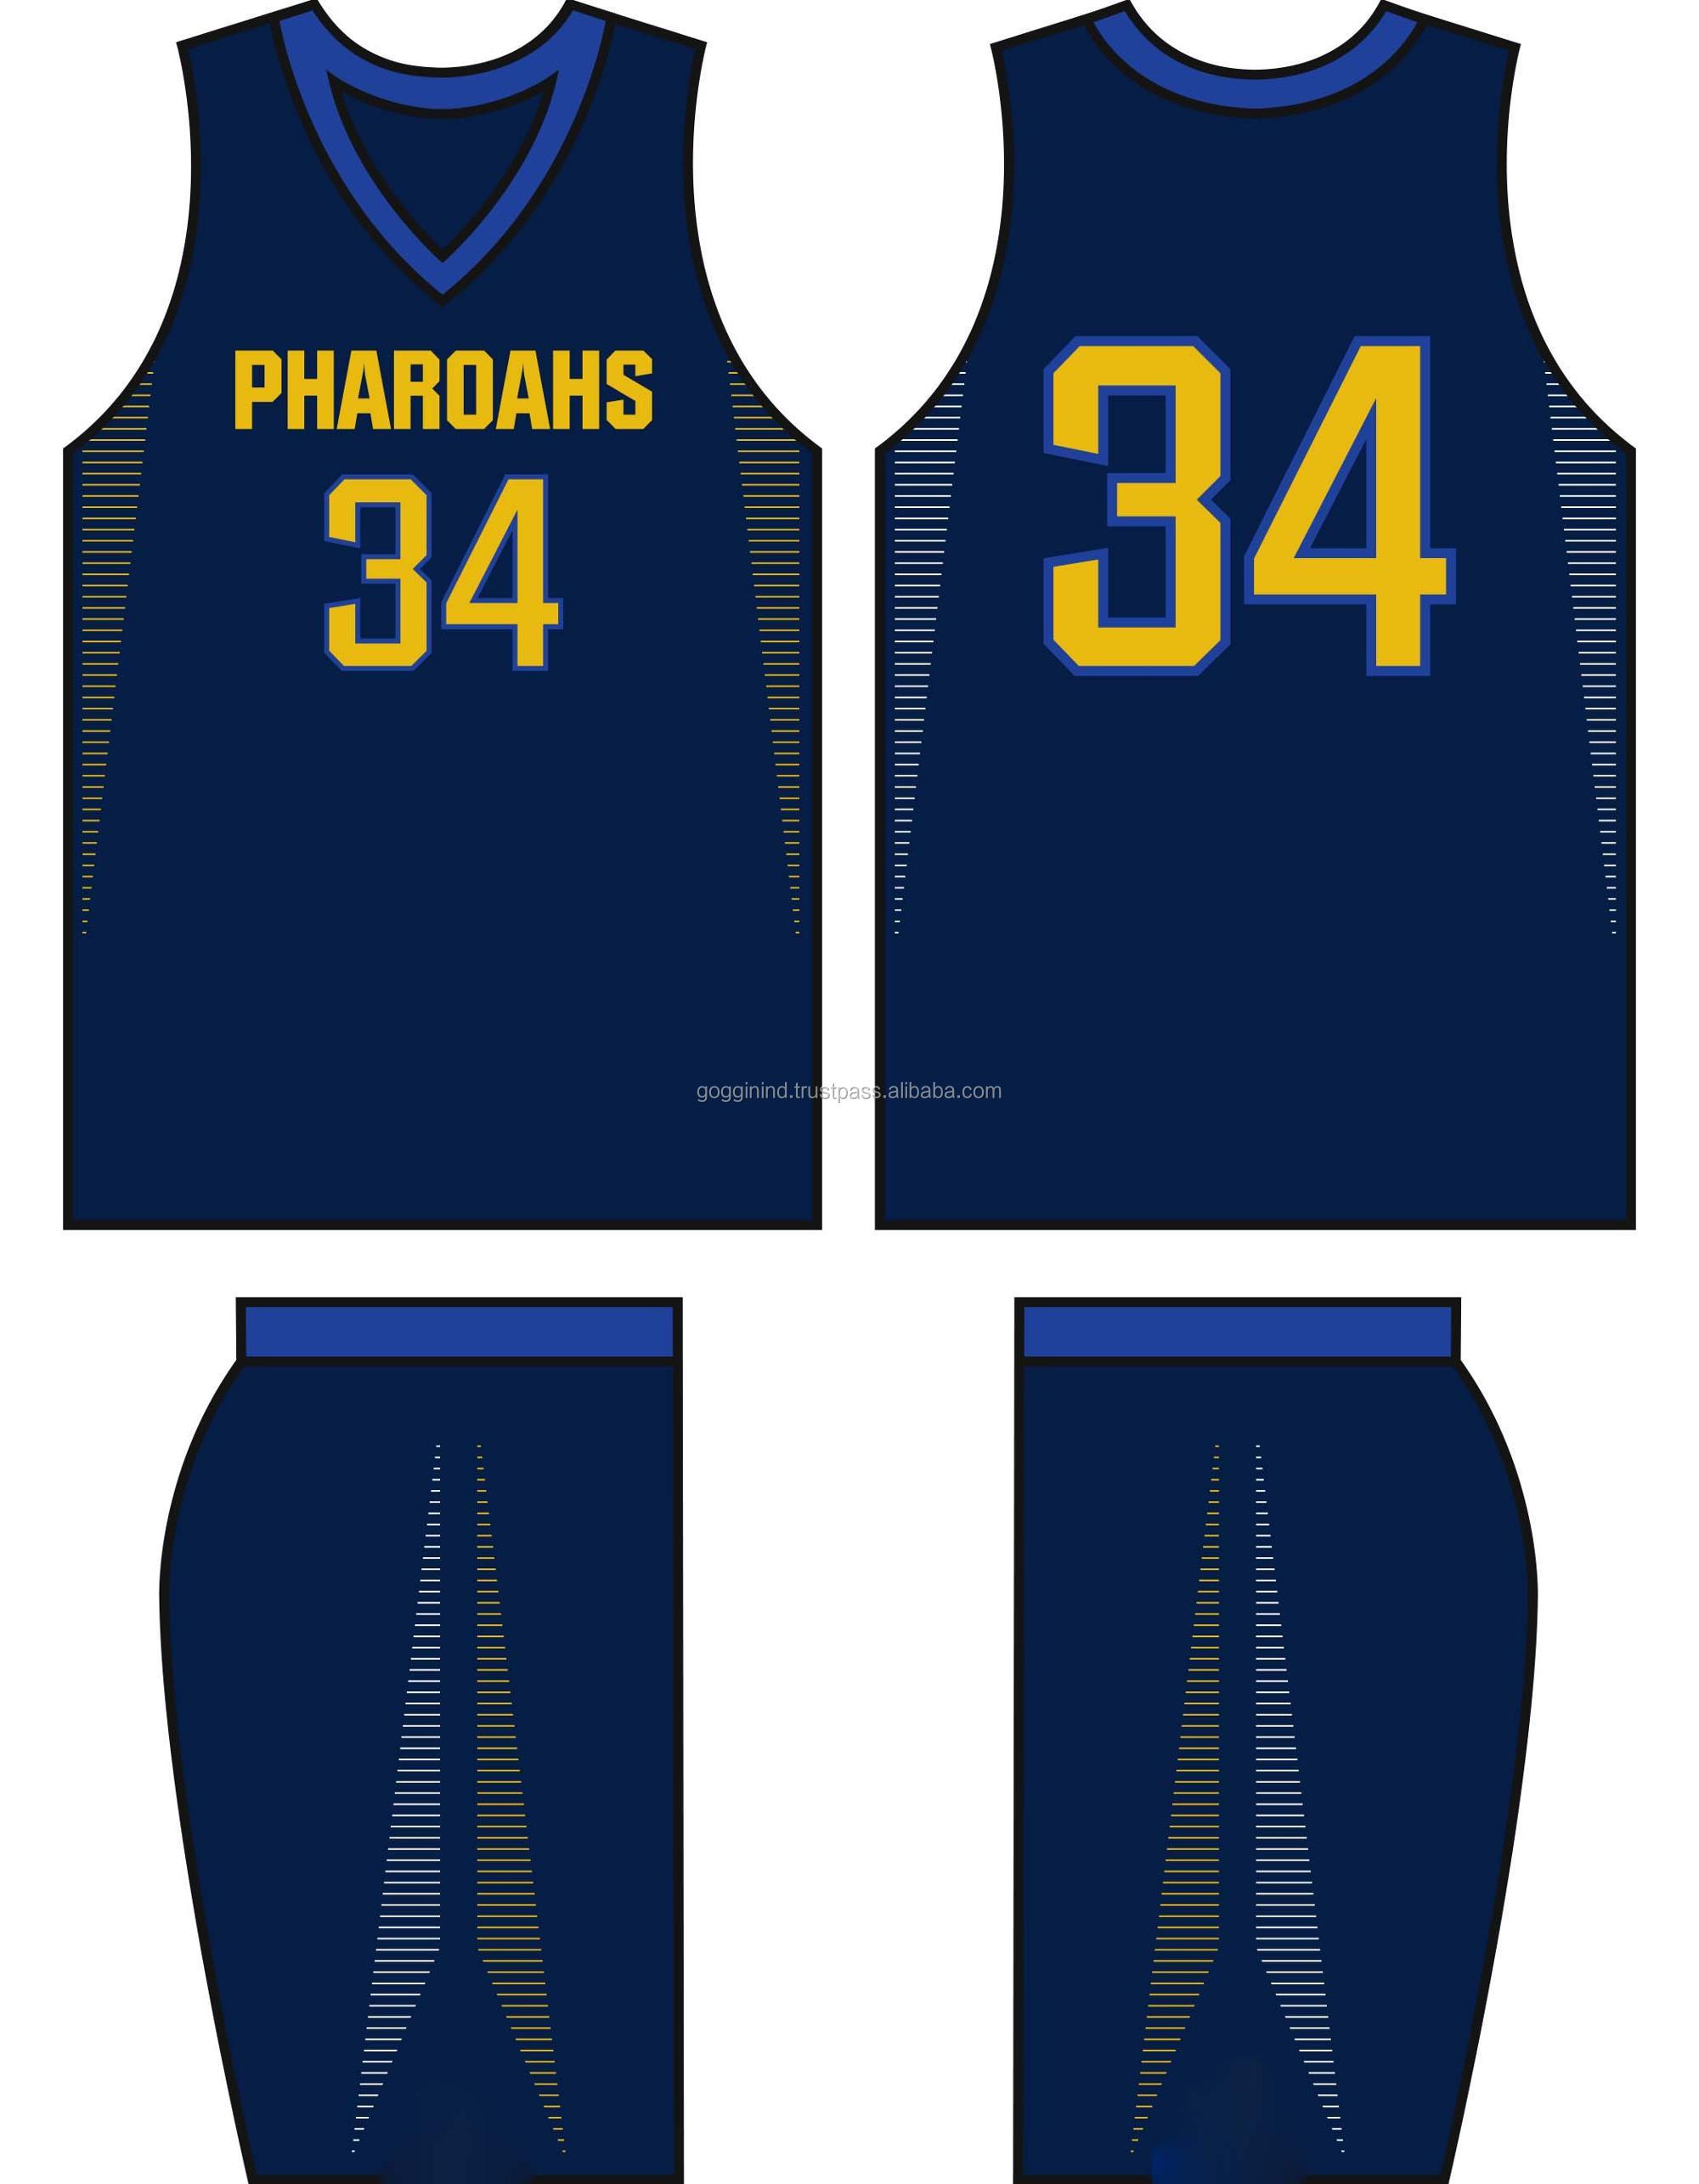 promo code 27508 6379c Free Sample International Style Basketball Jersey Golden State Basketball  Uniform - Buy Sublimated Basketball Uniform,Cheap Basketball Uniform,Custom  ...